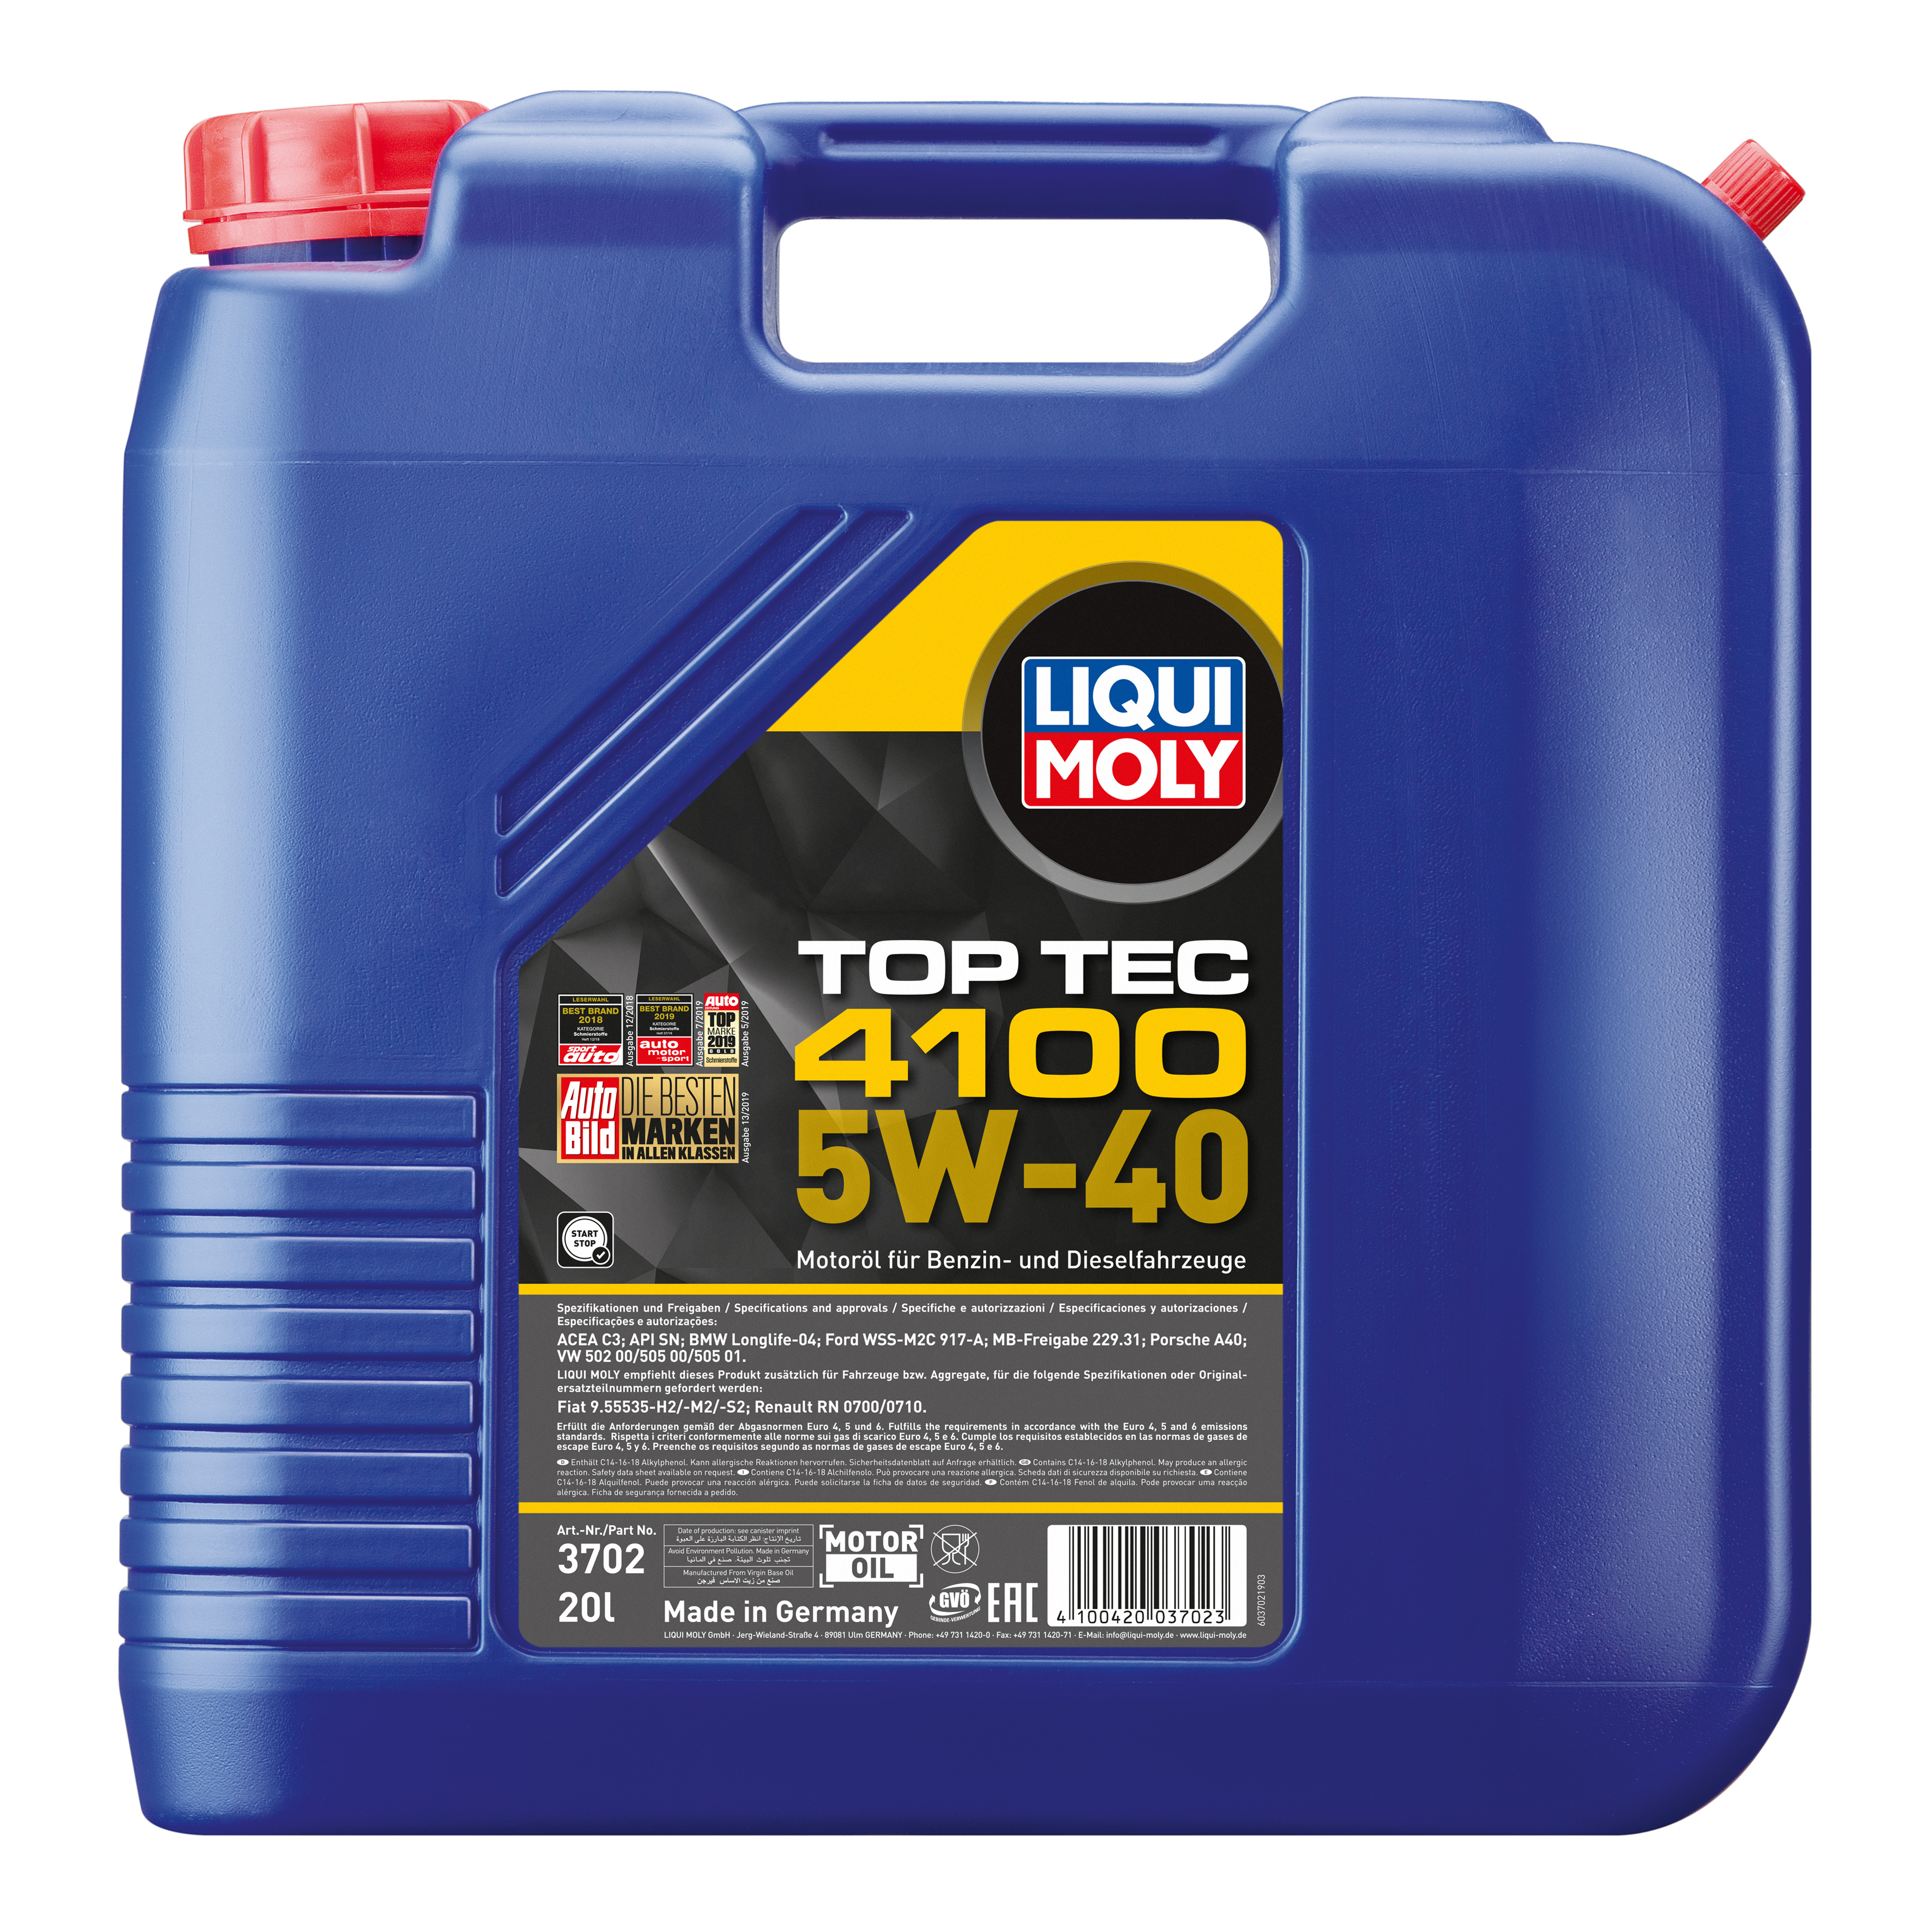 Liqui Moly Top Tec 4100 SAE 5W-40